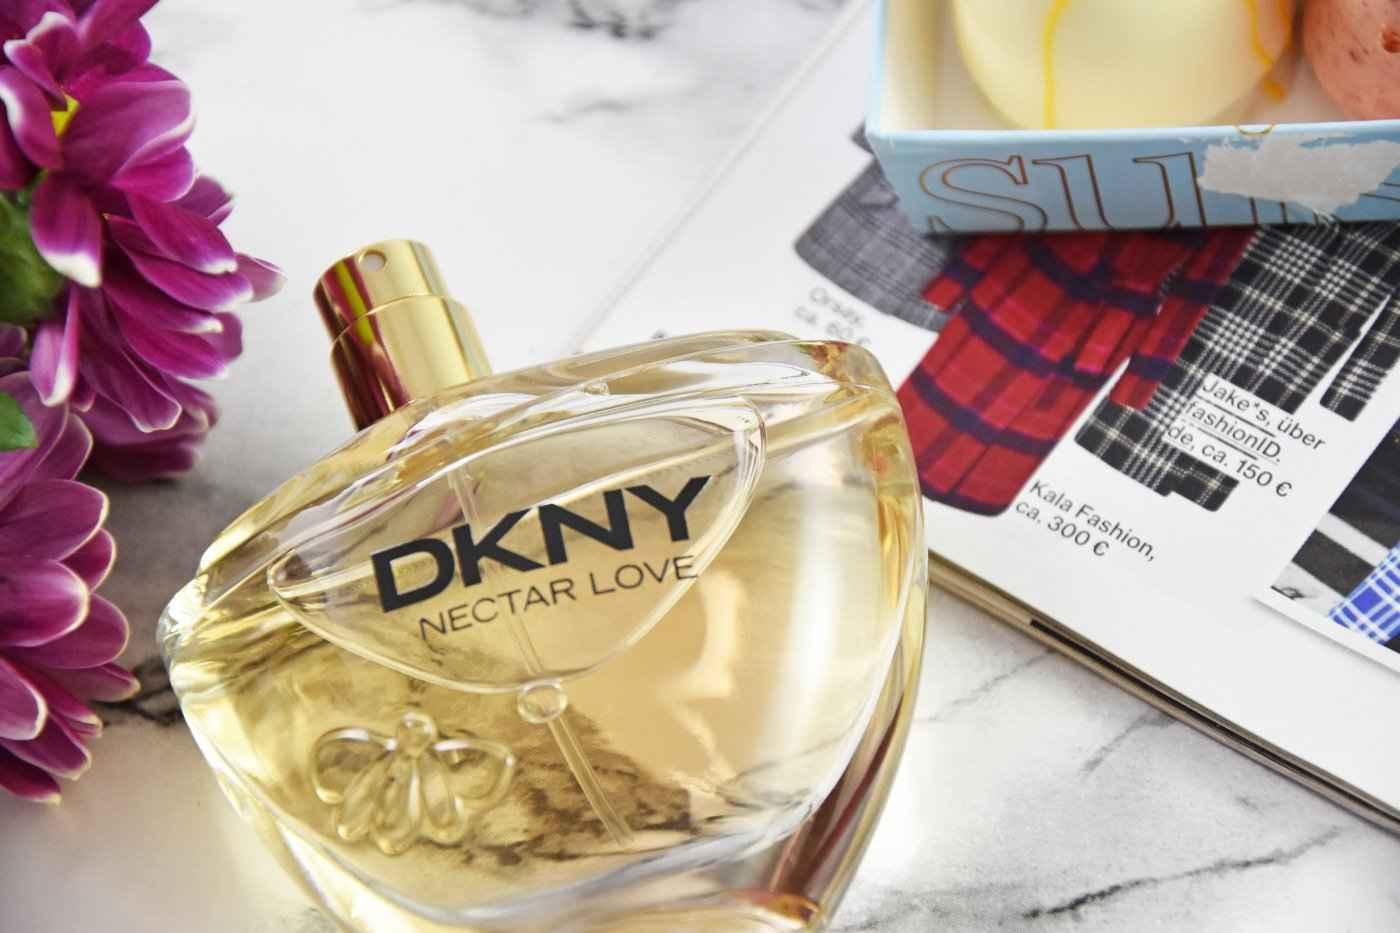 DKNY - Nectar Love